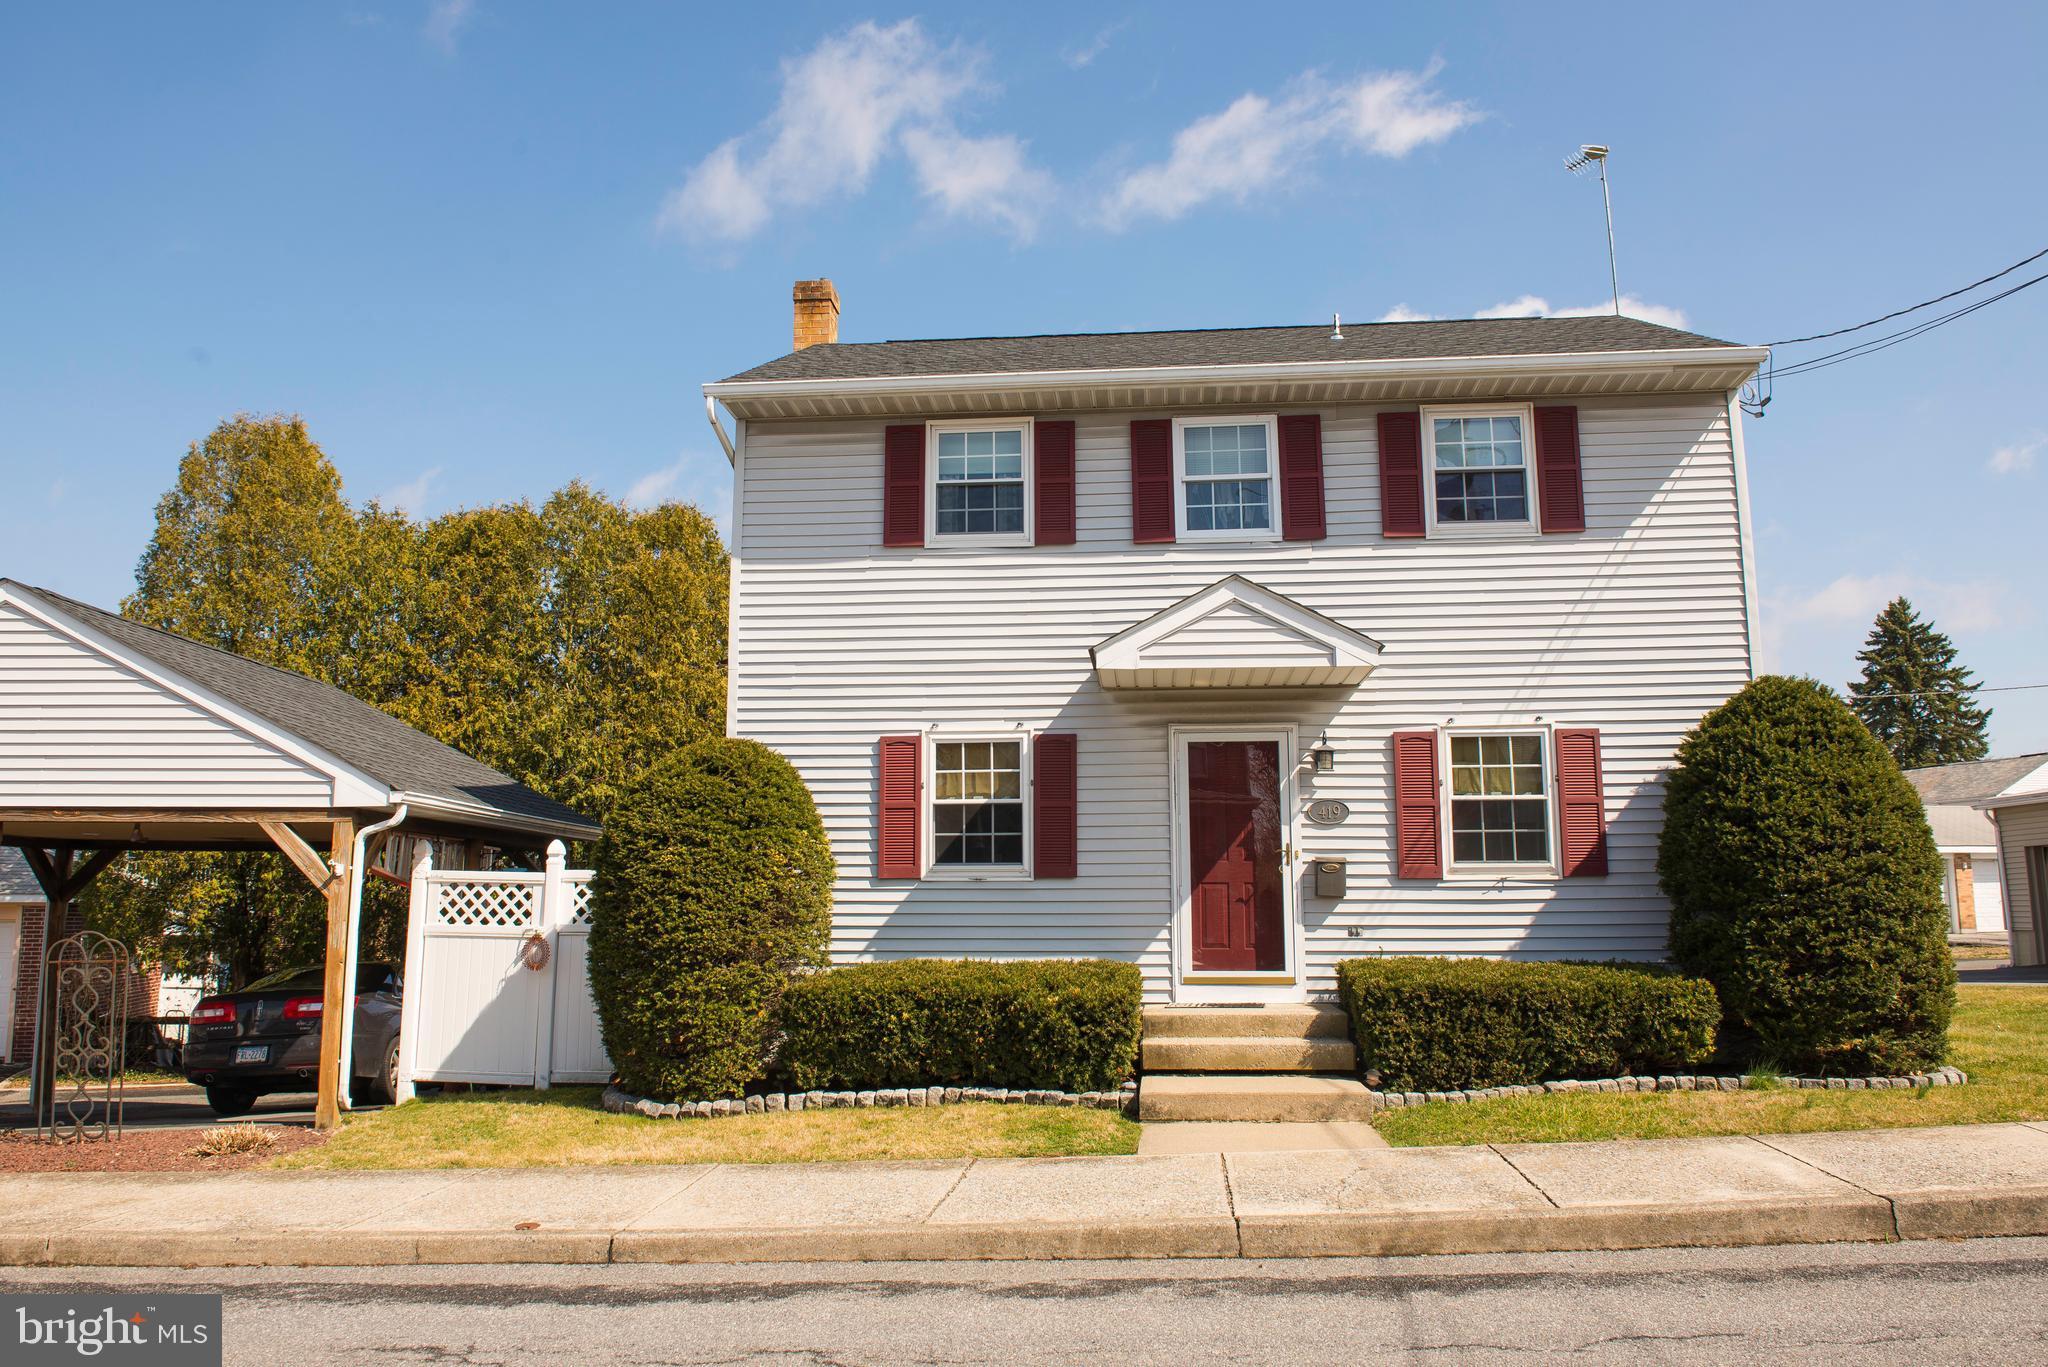 419 N 5TH STREET, EMMAUS, PA 18049